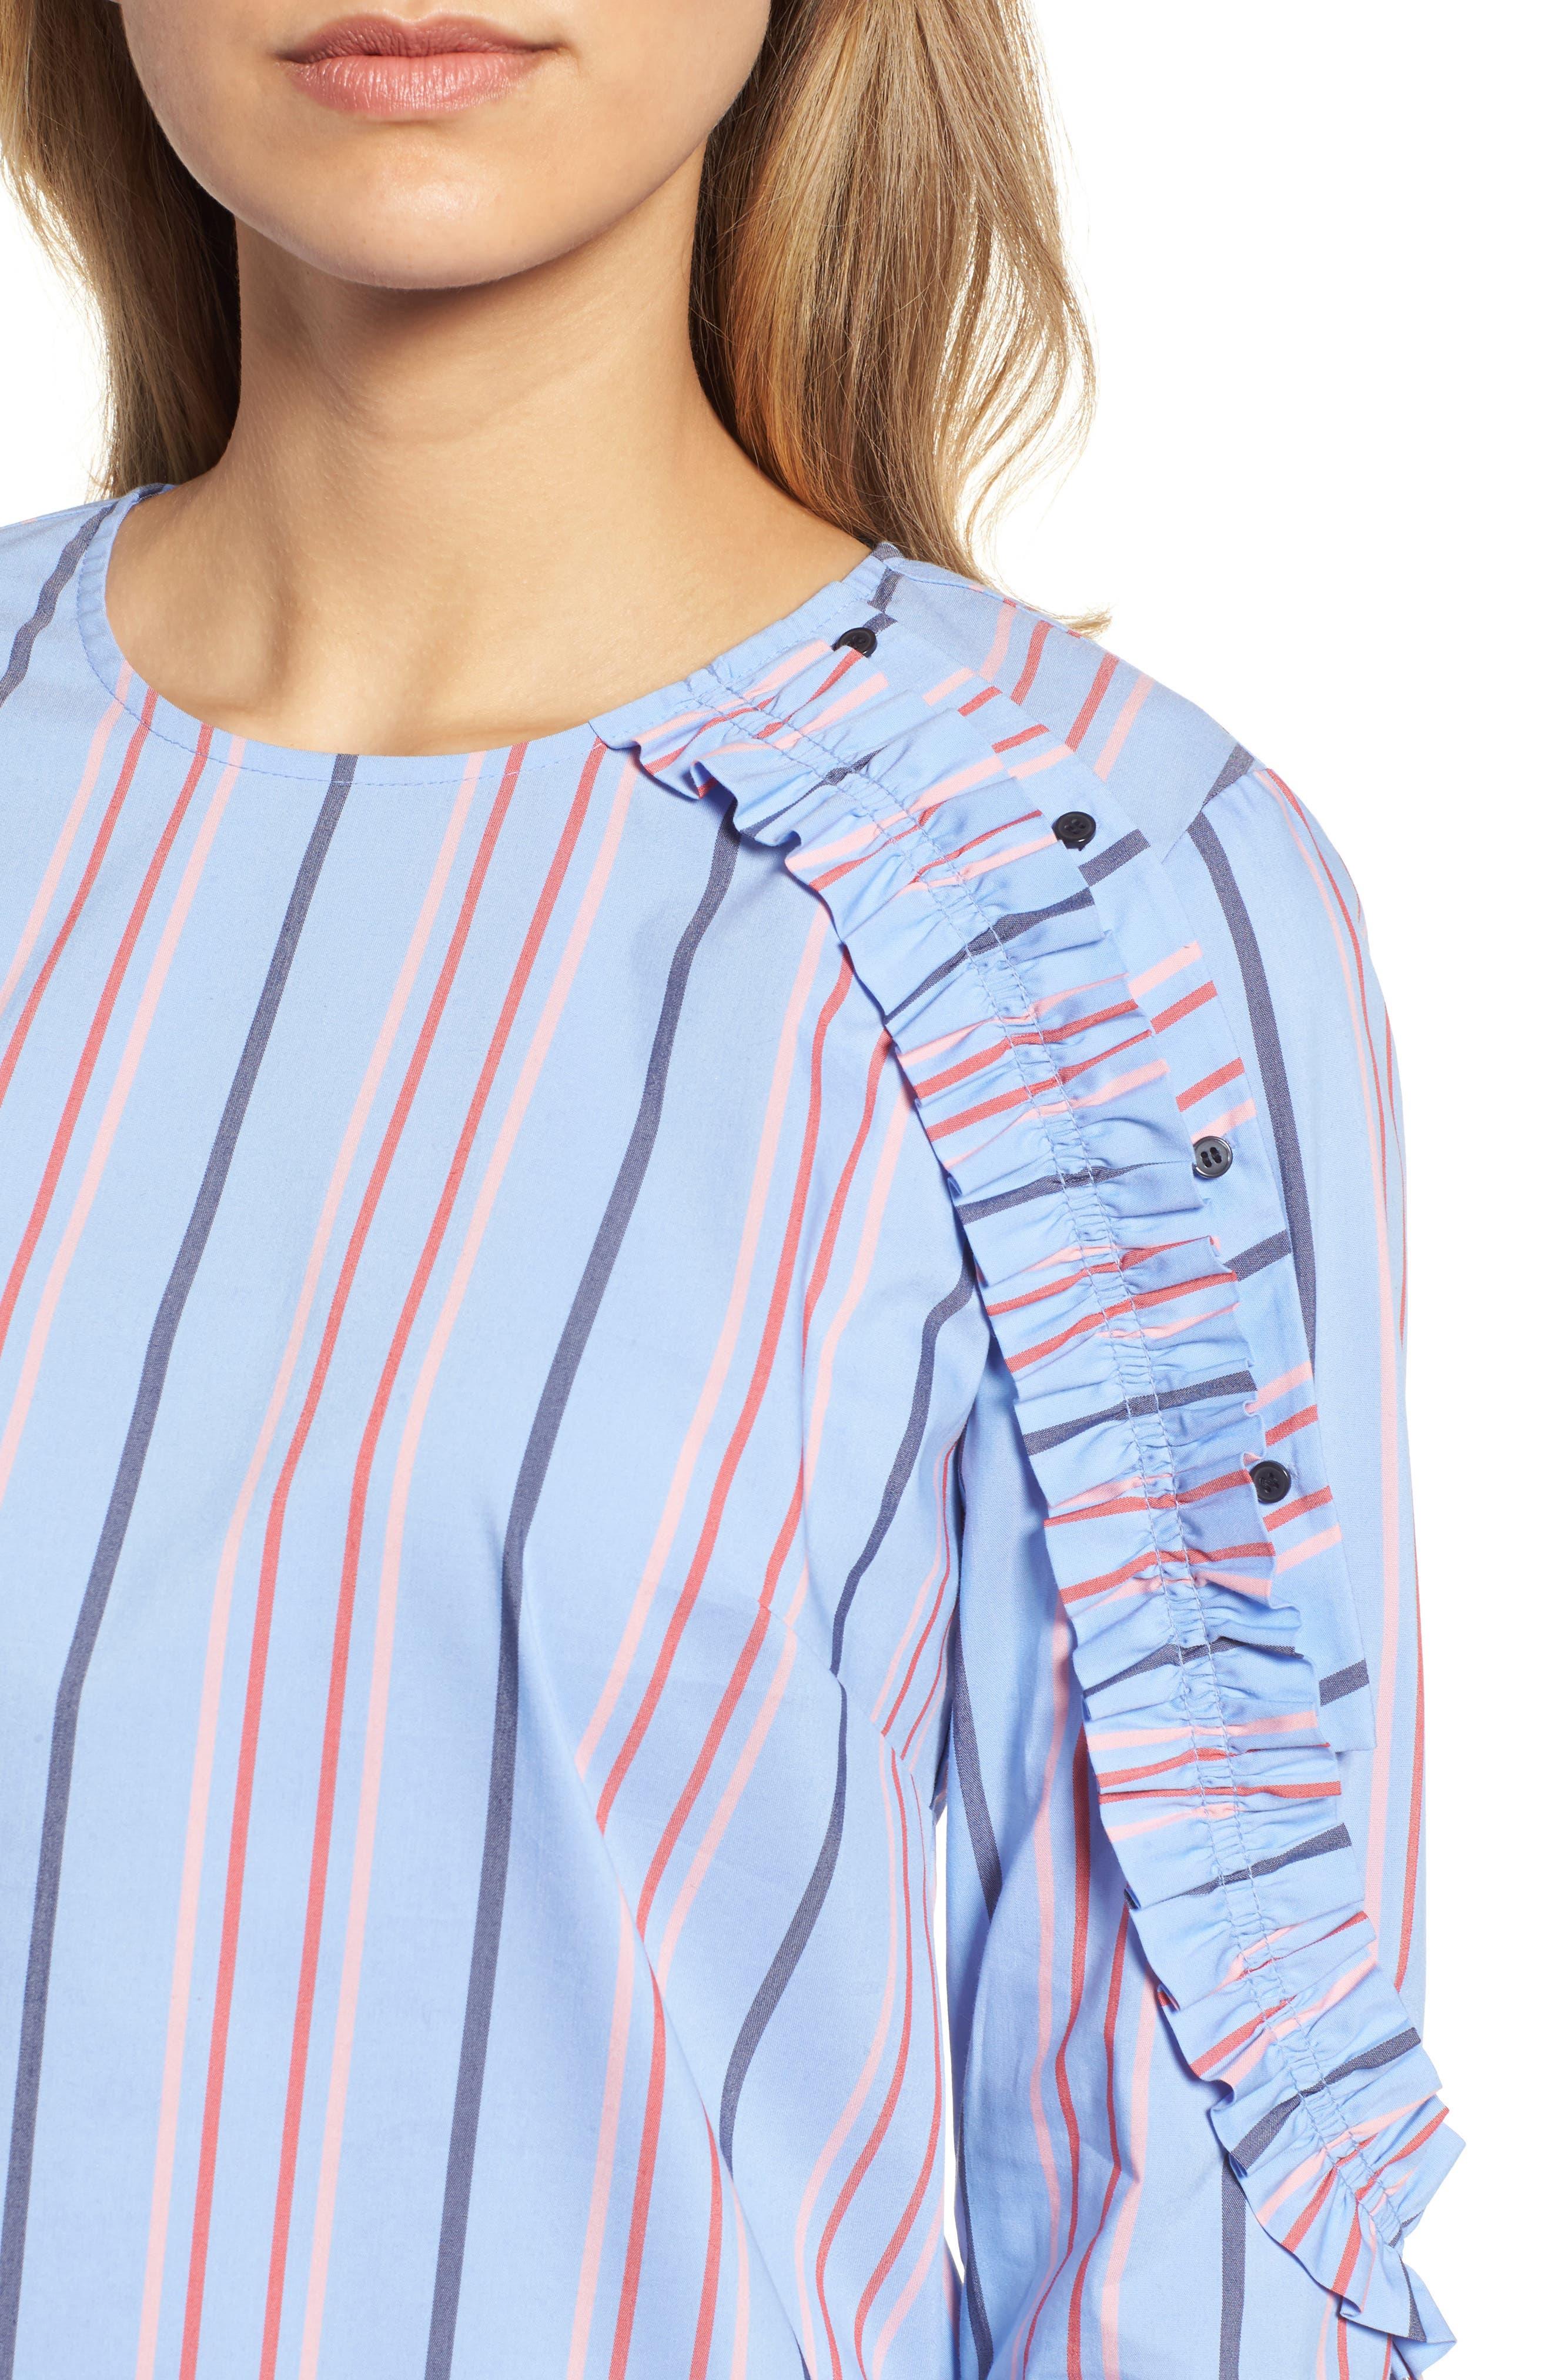 Ruffle Detail Poplin Shirt,                             Alternate thumbnail 4, color,                             Blue Multi Stripe